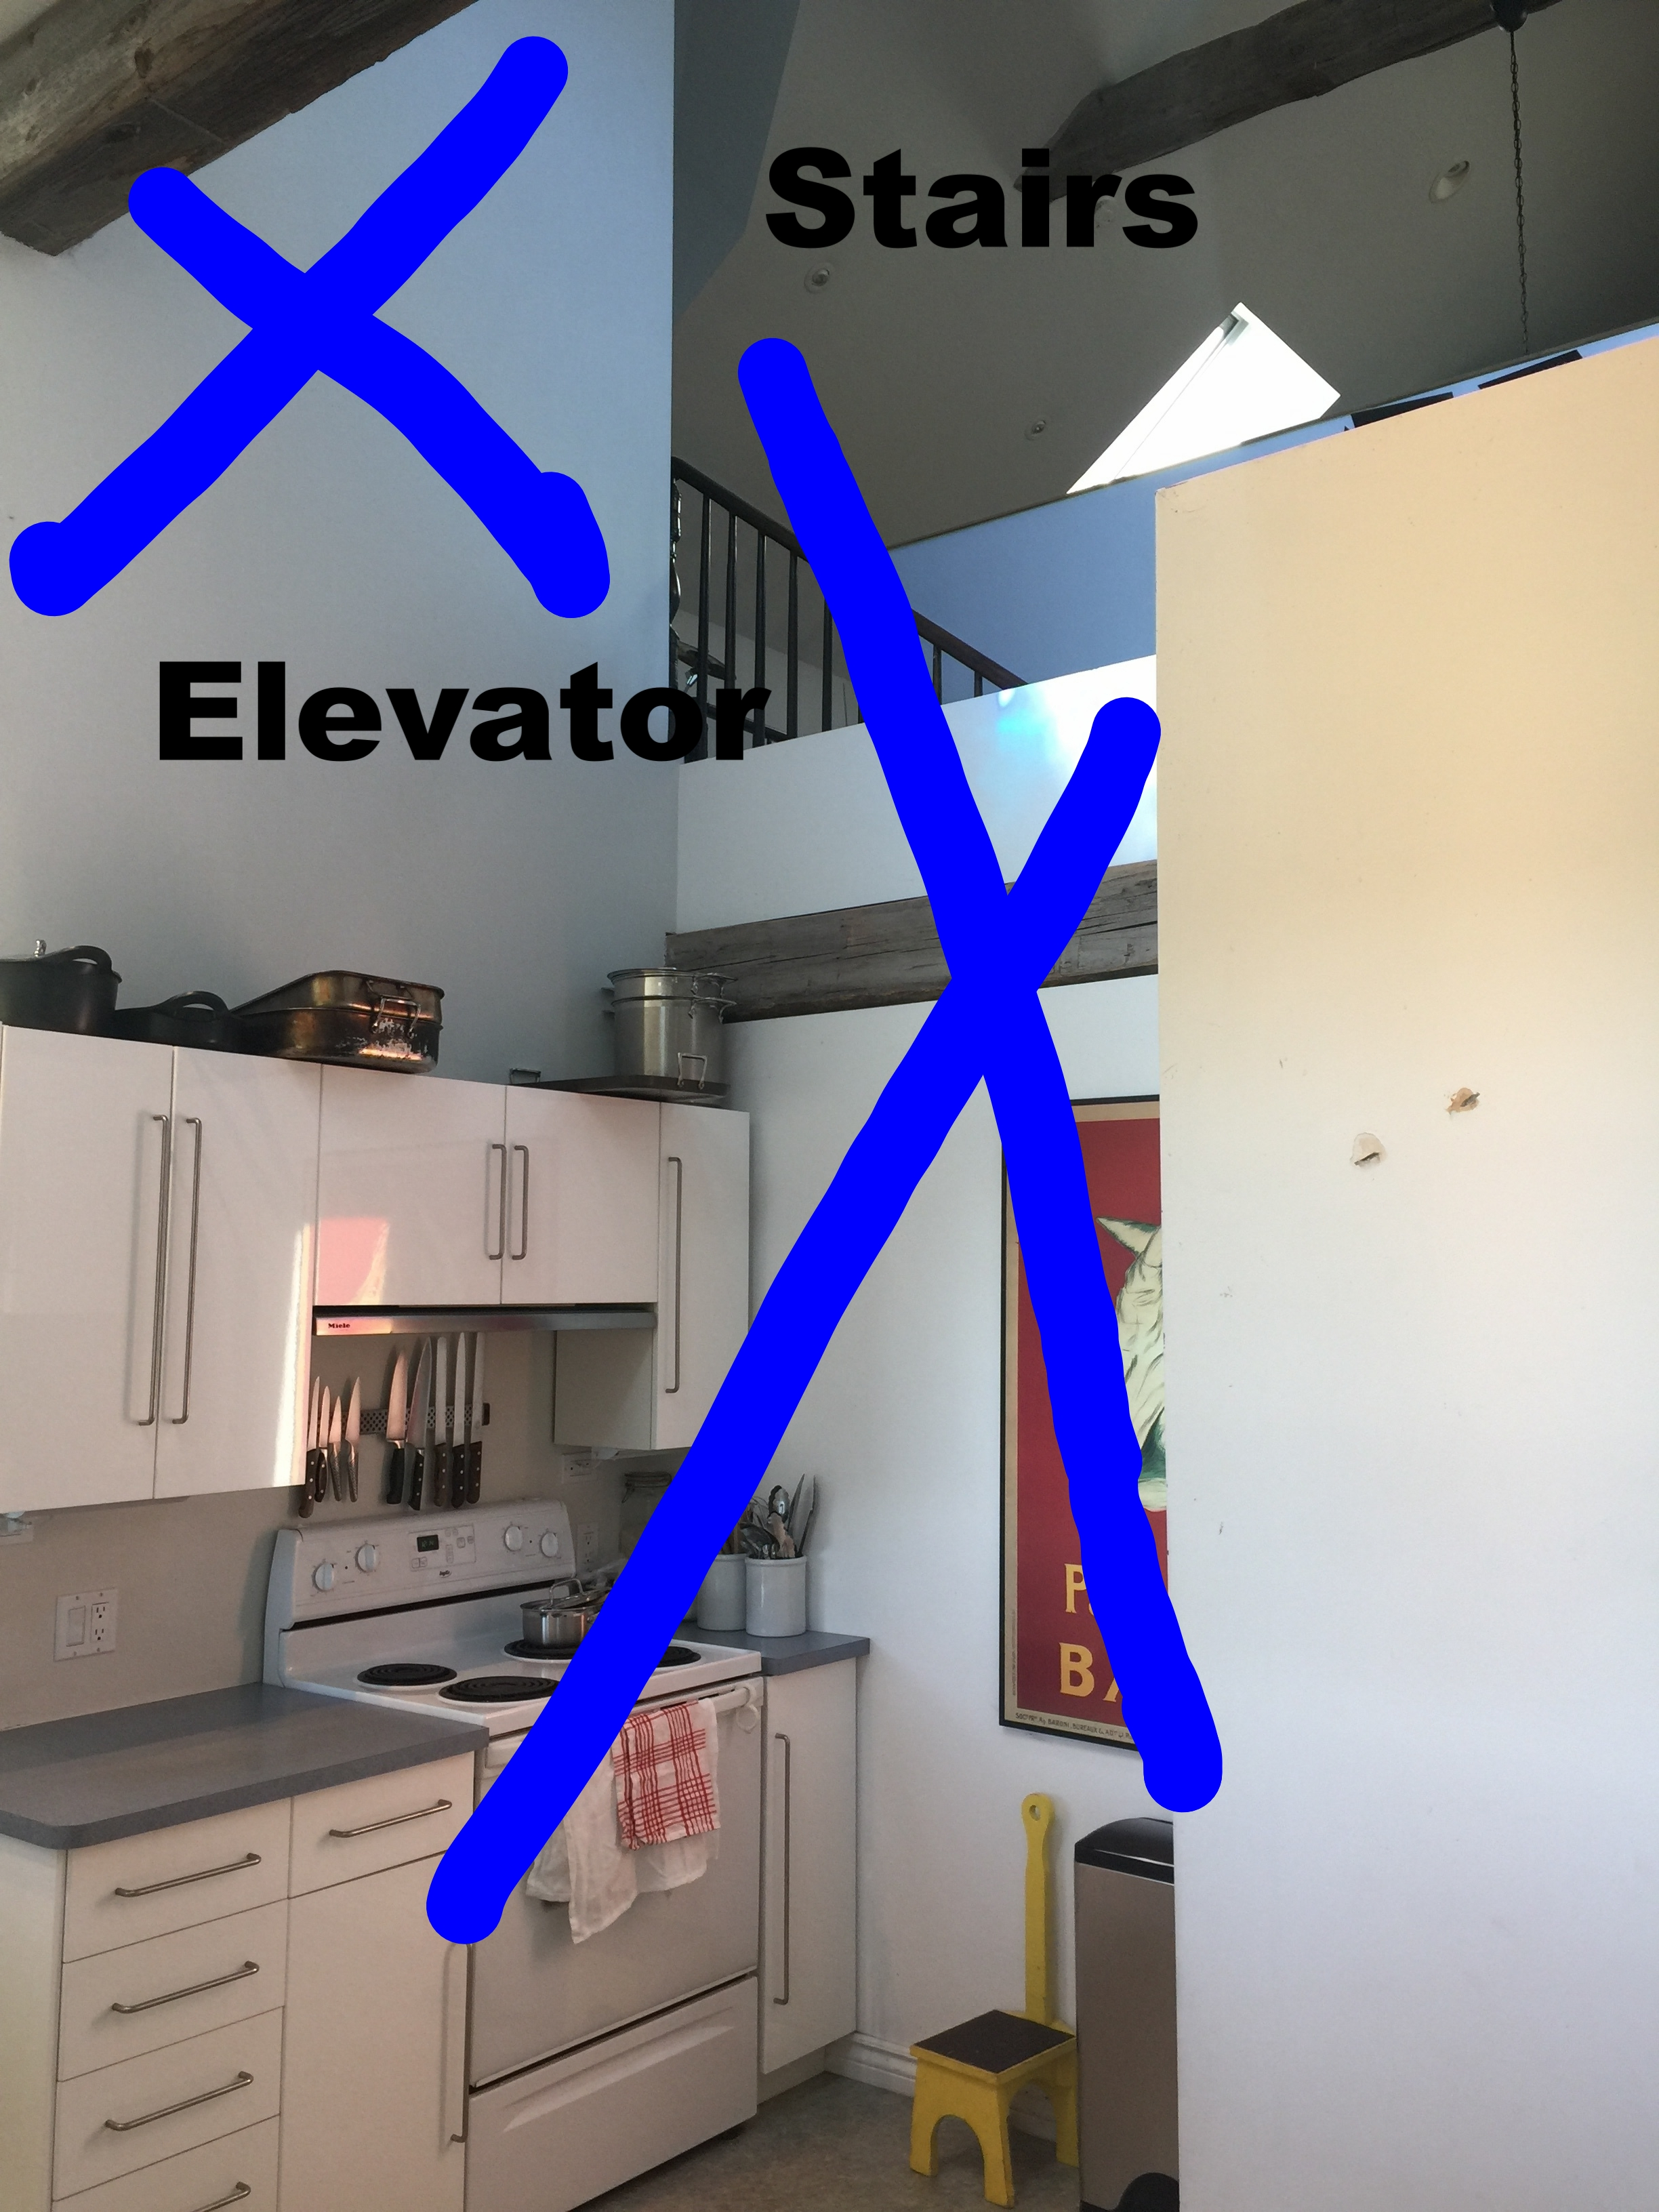 Kitchen Before Stove:Stairs.JPG